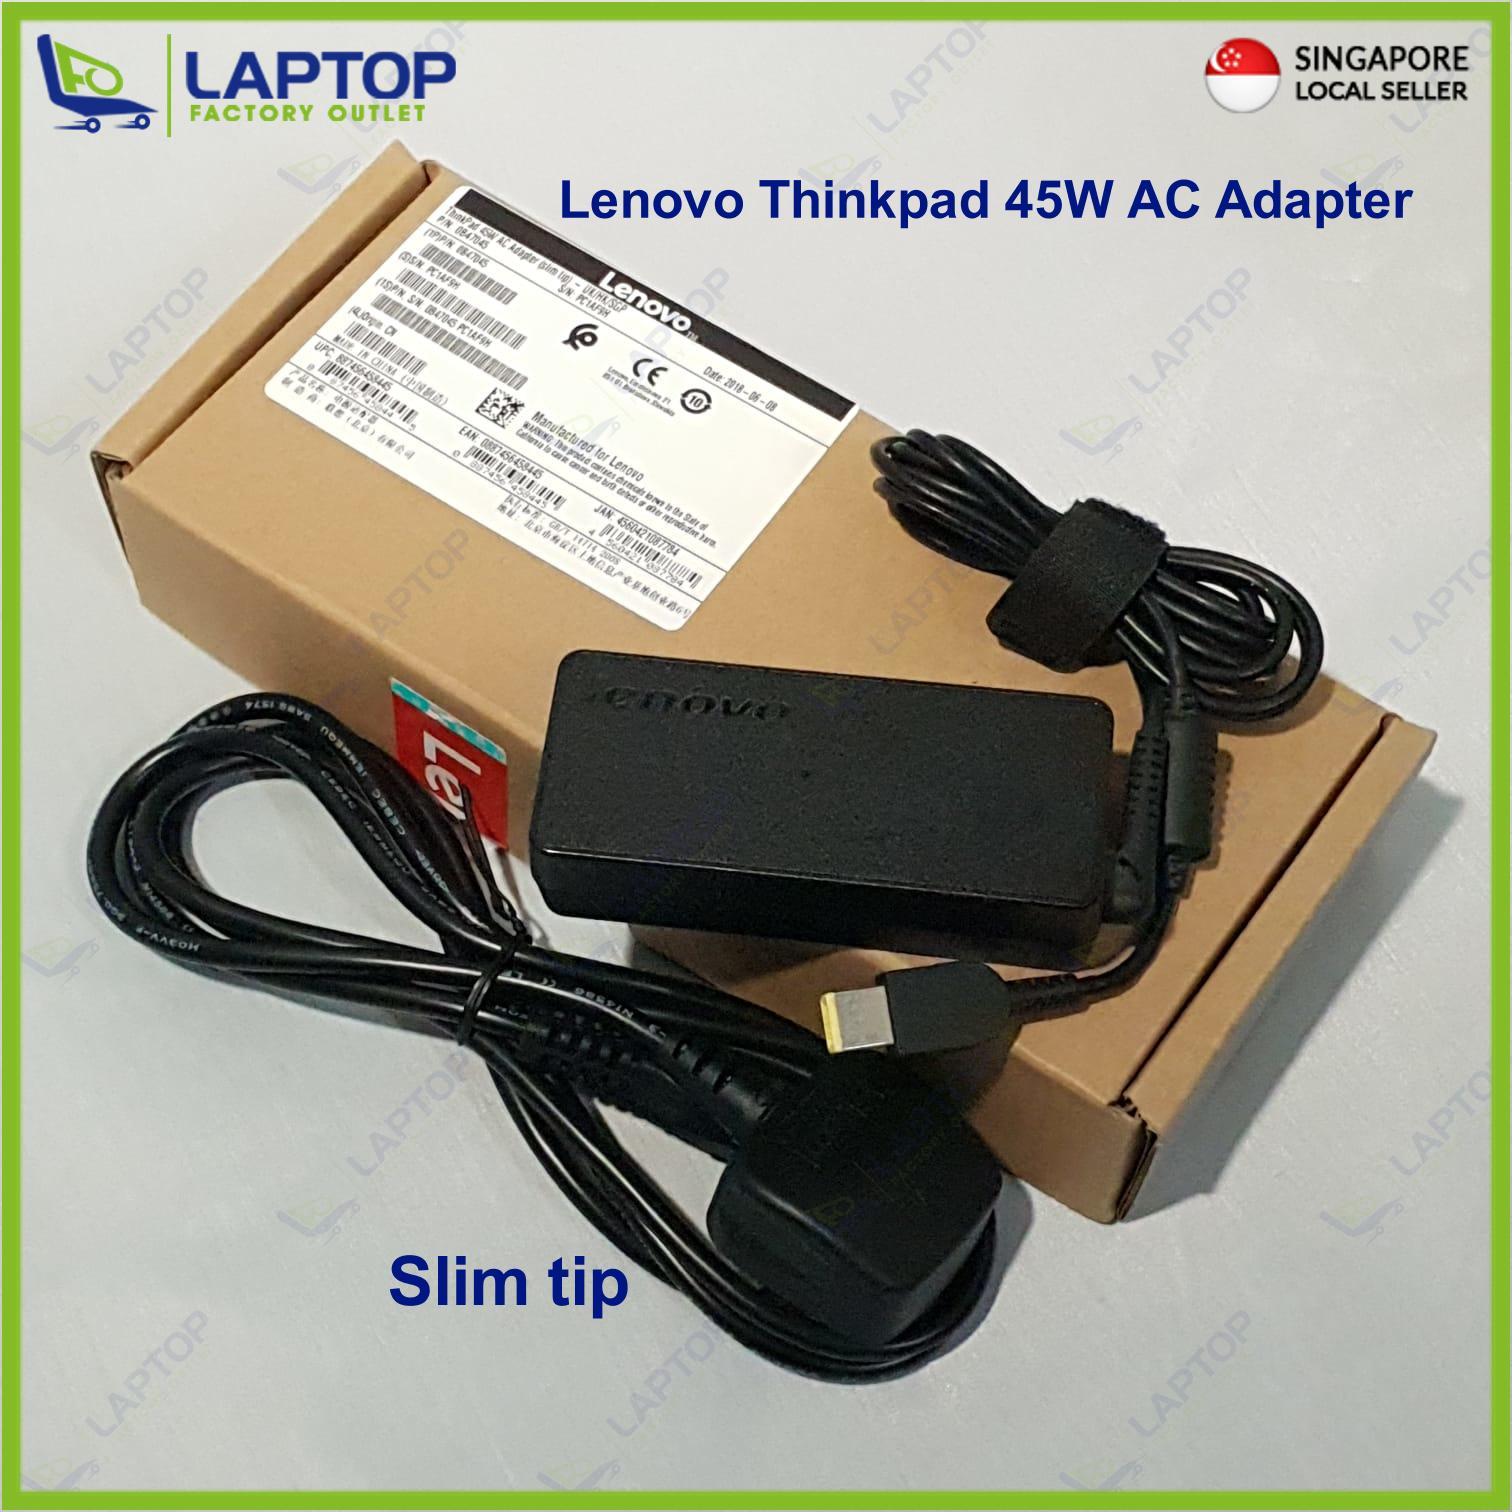 LENOVO Thinkpad 45W AC Adapter [Brand NEW]